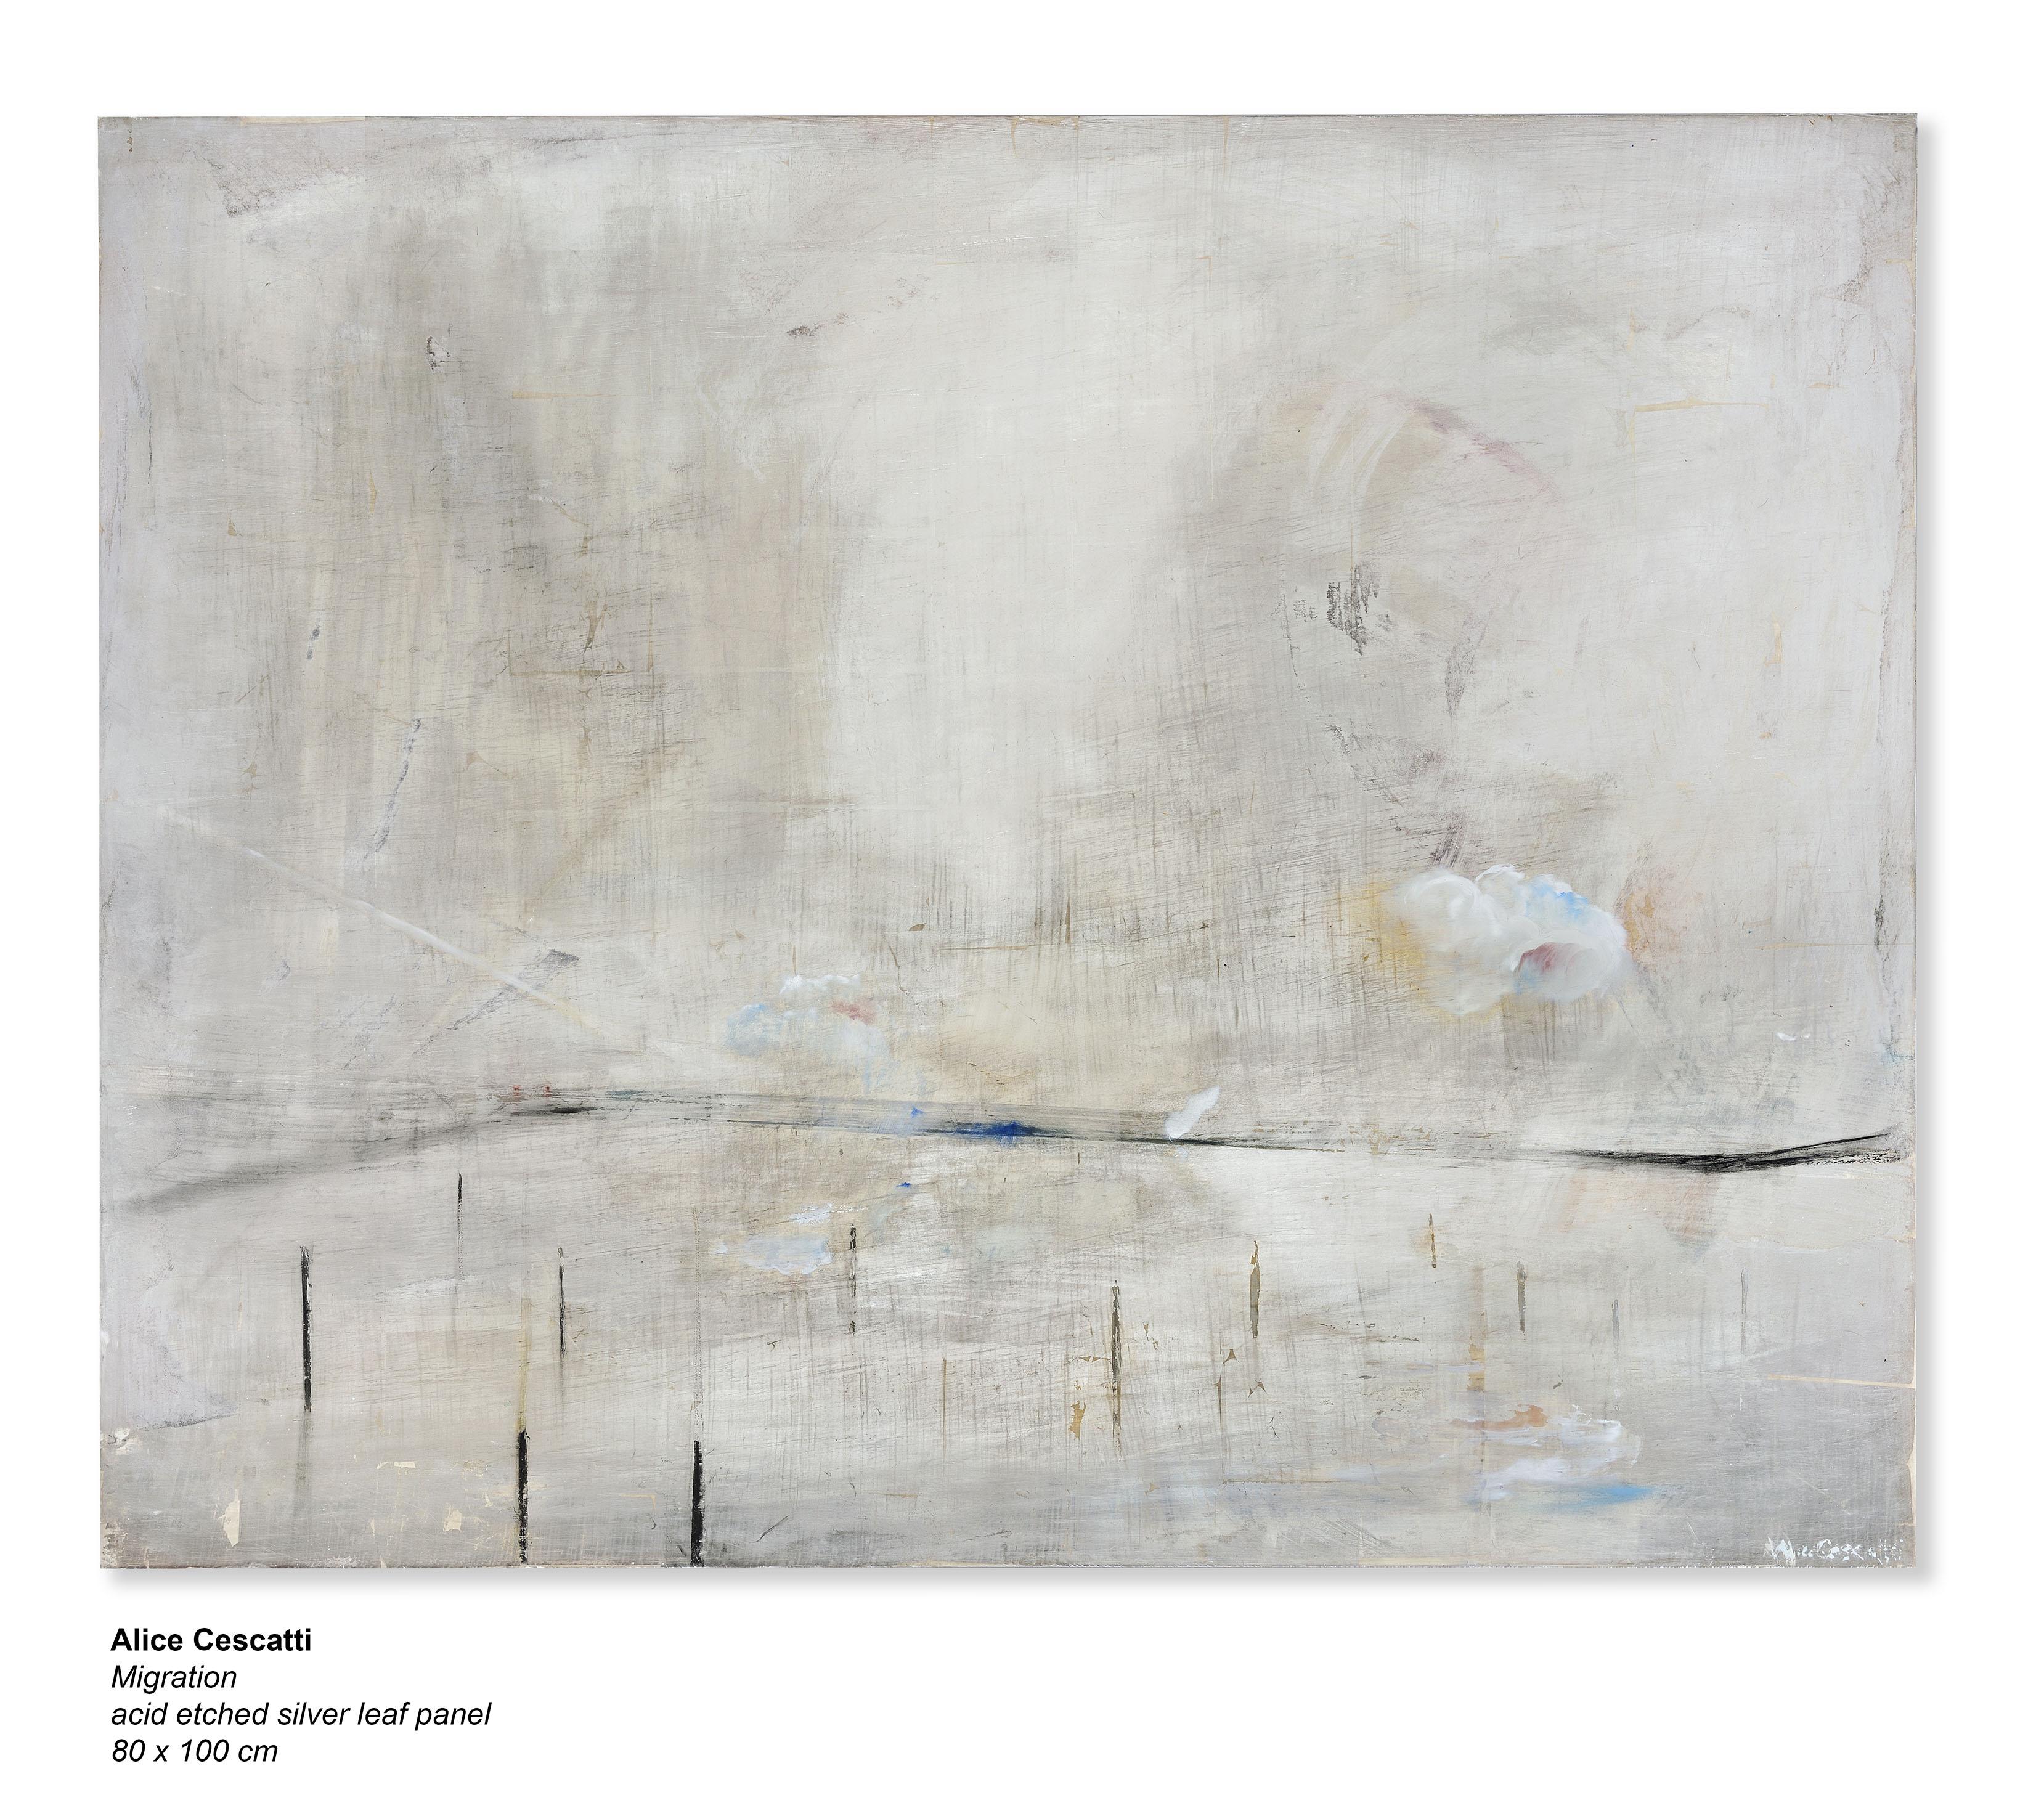 Migration by Alice Cescatti